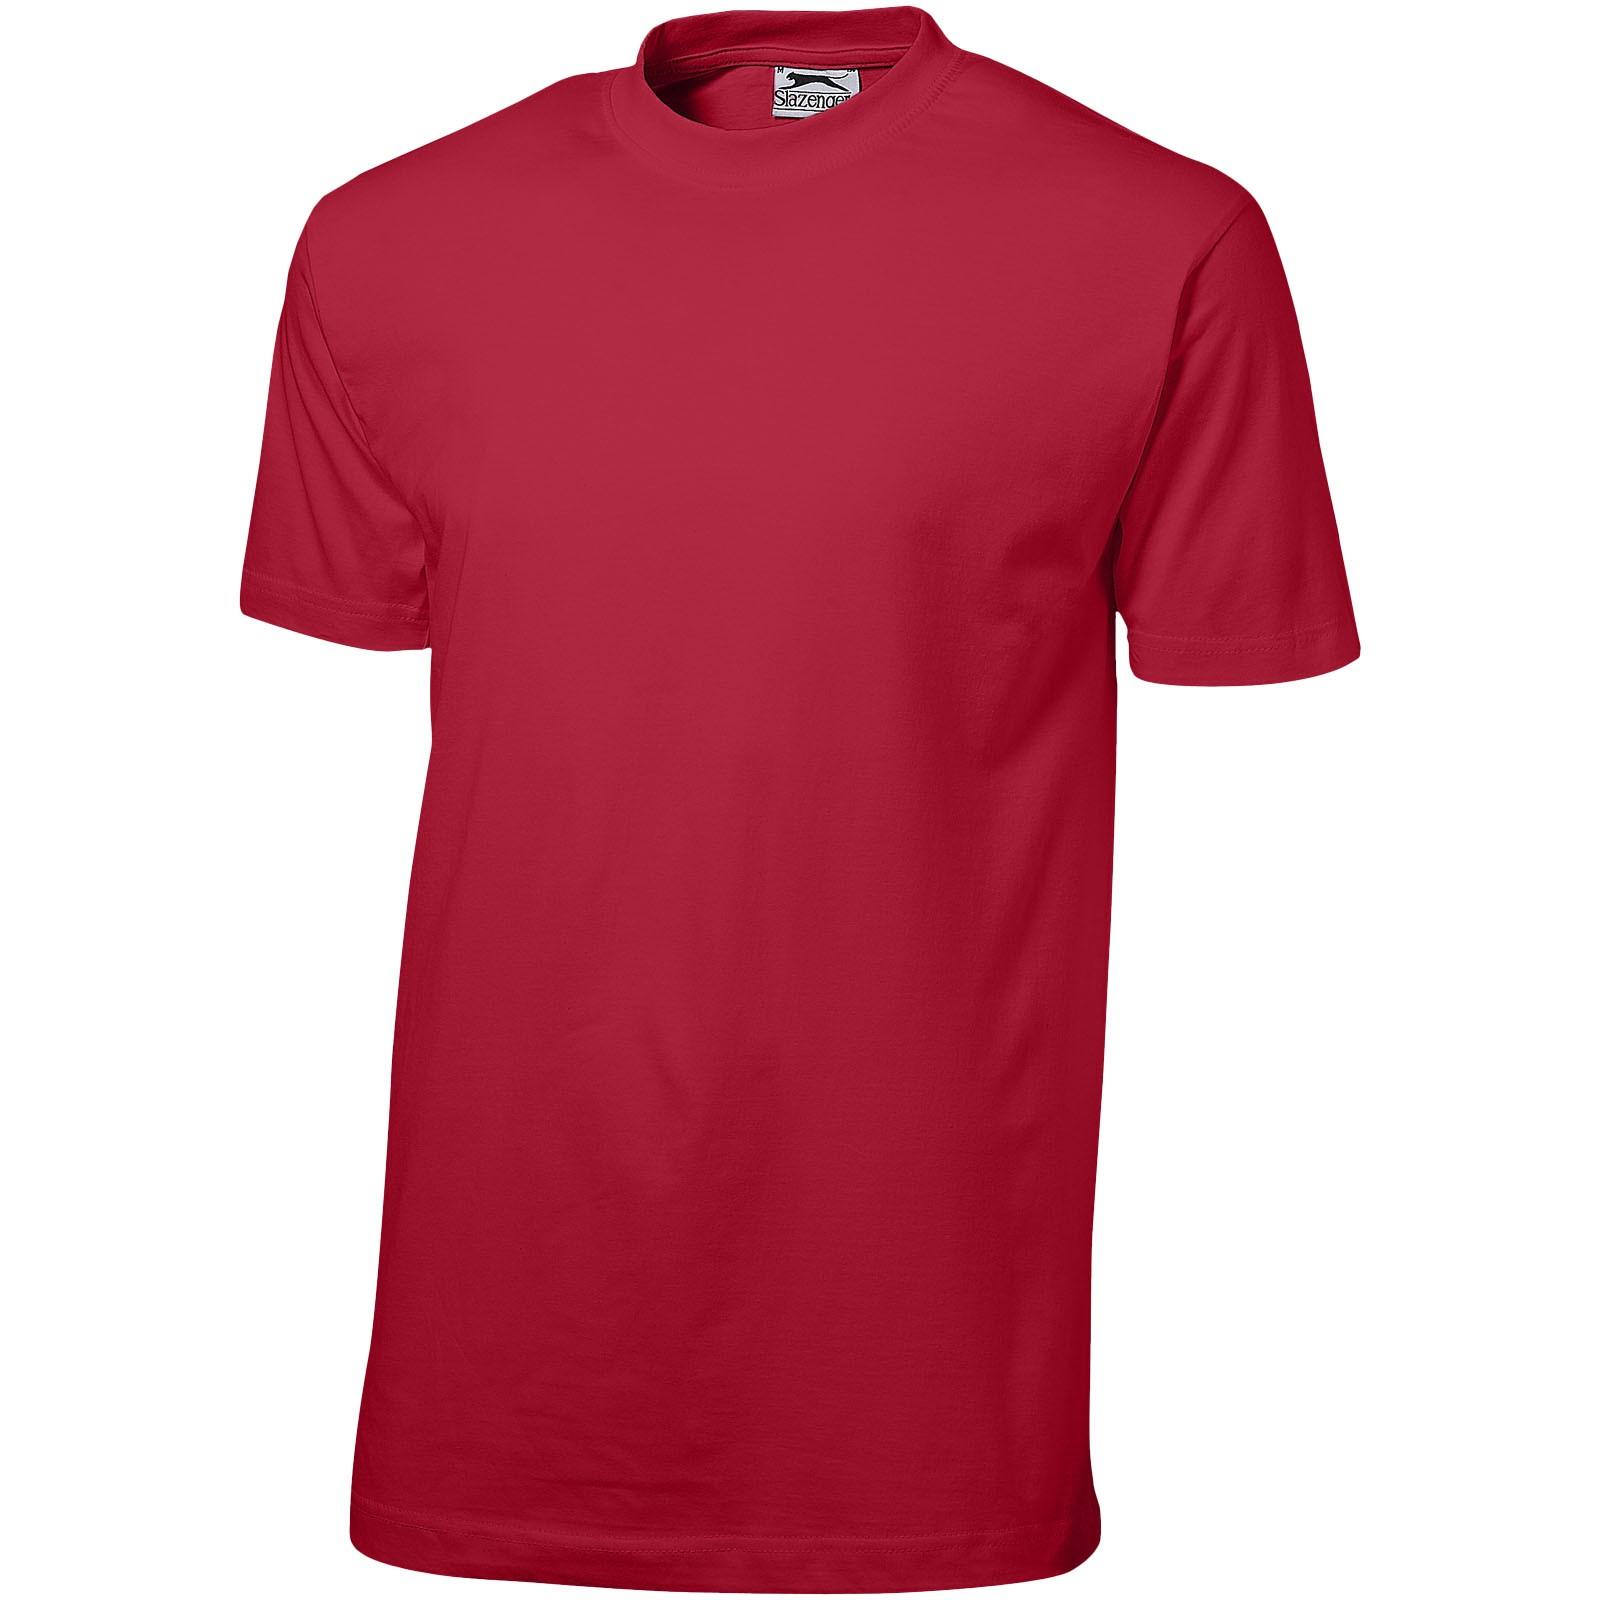 Ace short sleeve men's t-shirt - Dark red / L